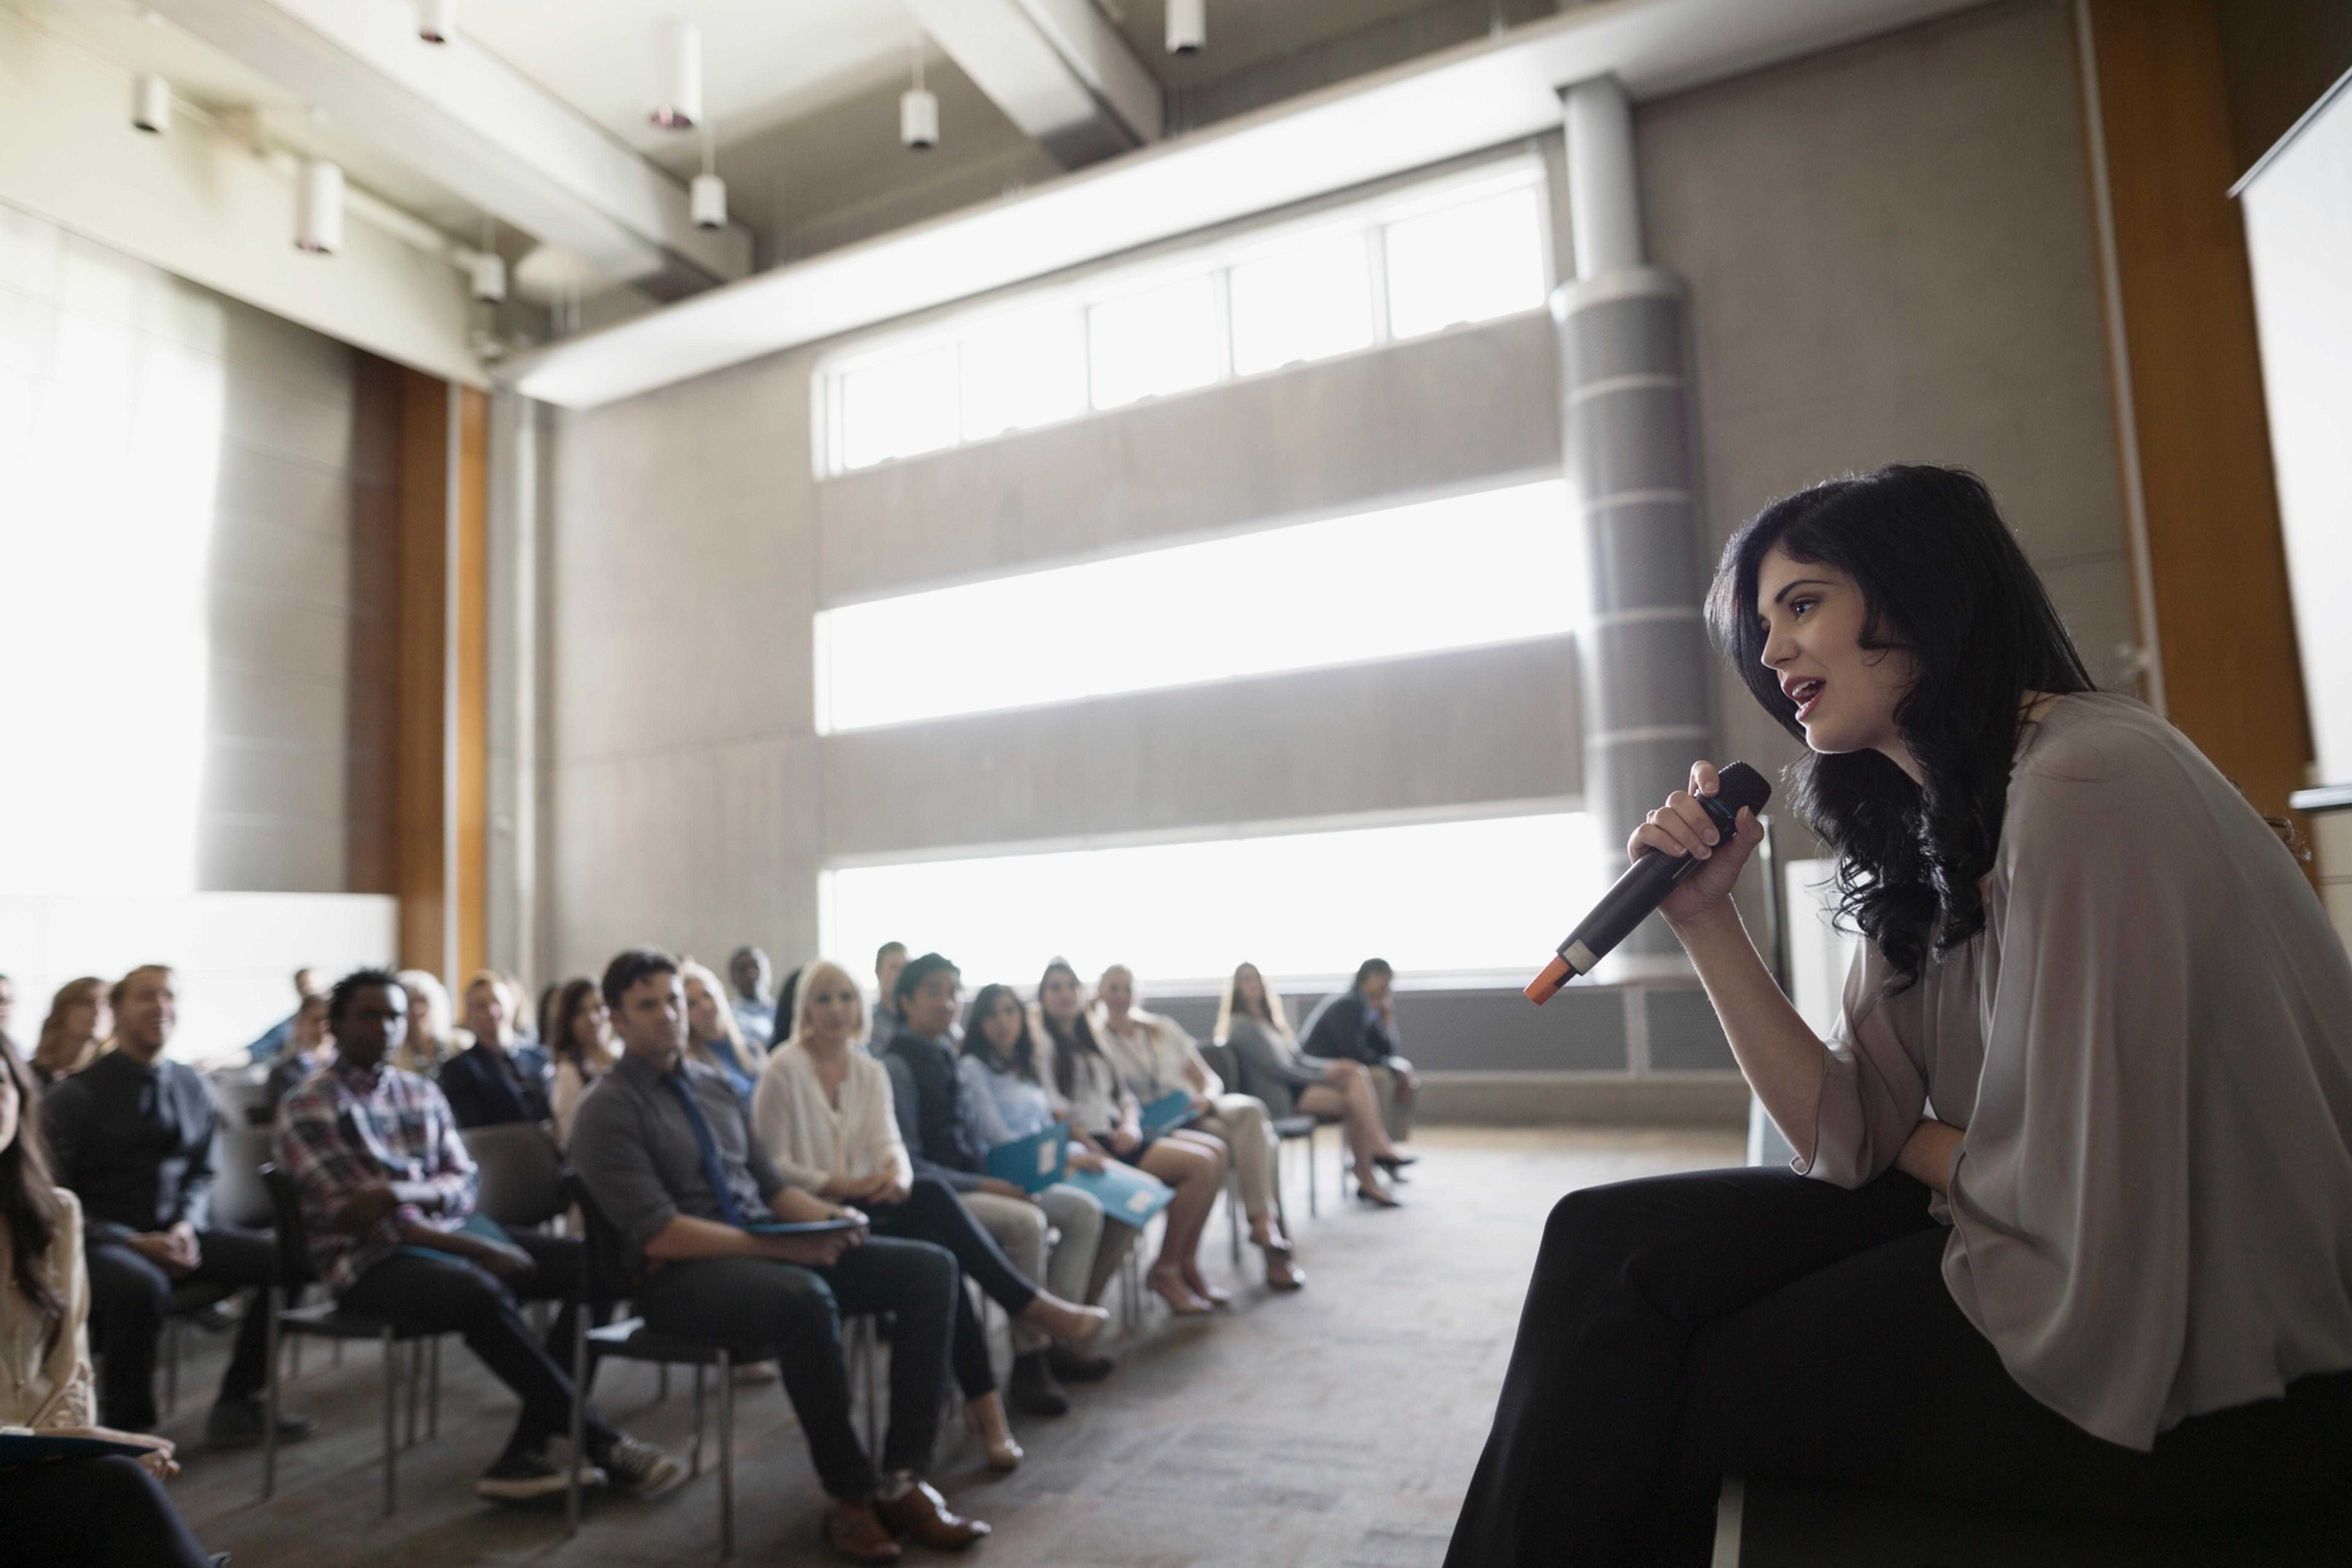 Speaker - various topics